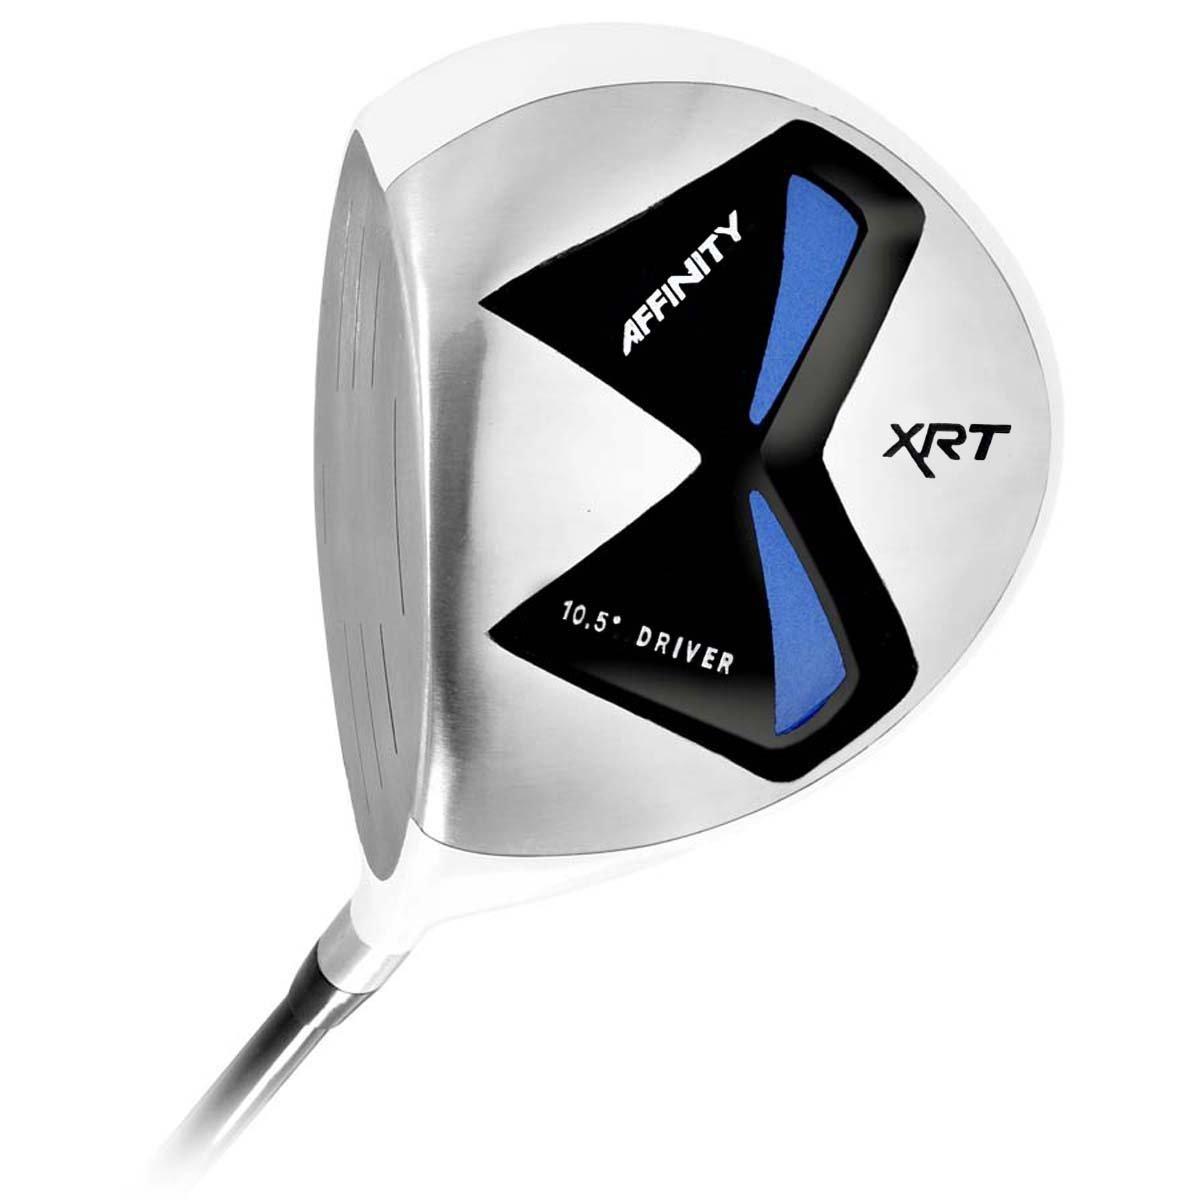 Mens Affinity XRT Golf Drivers